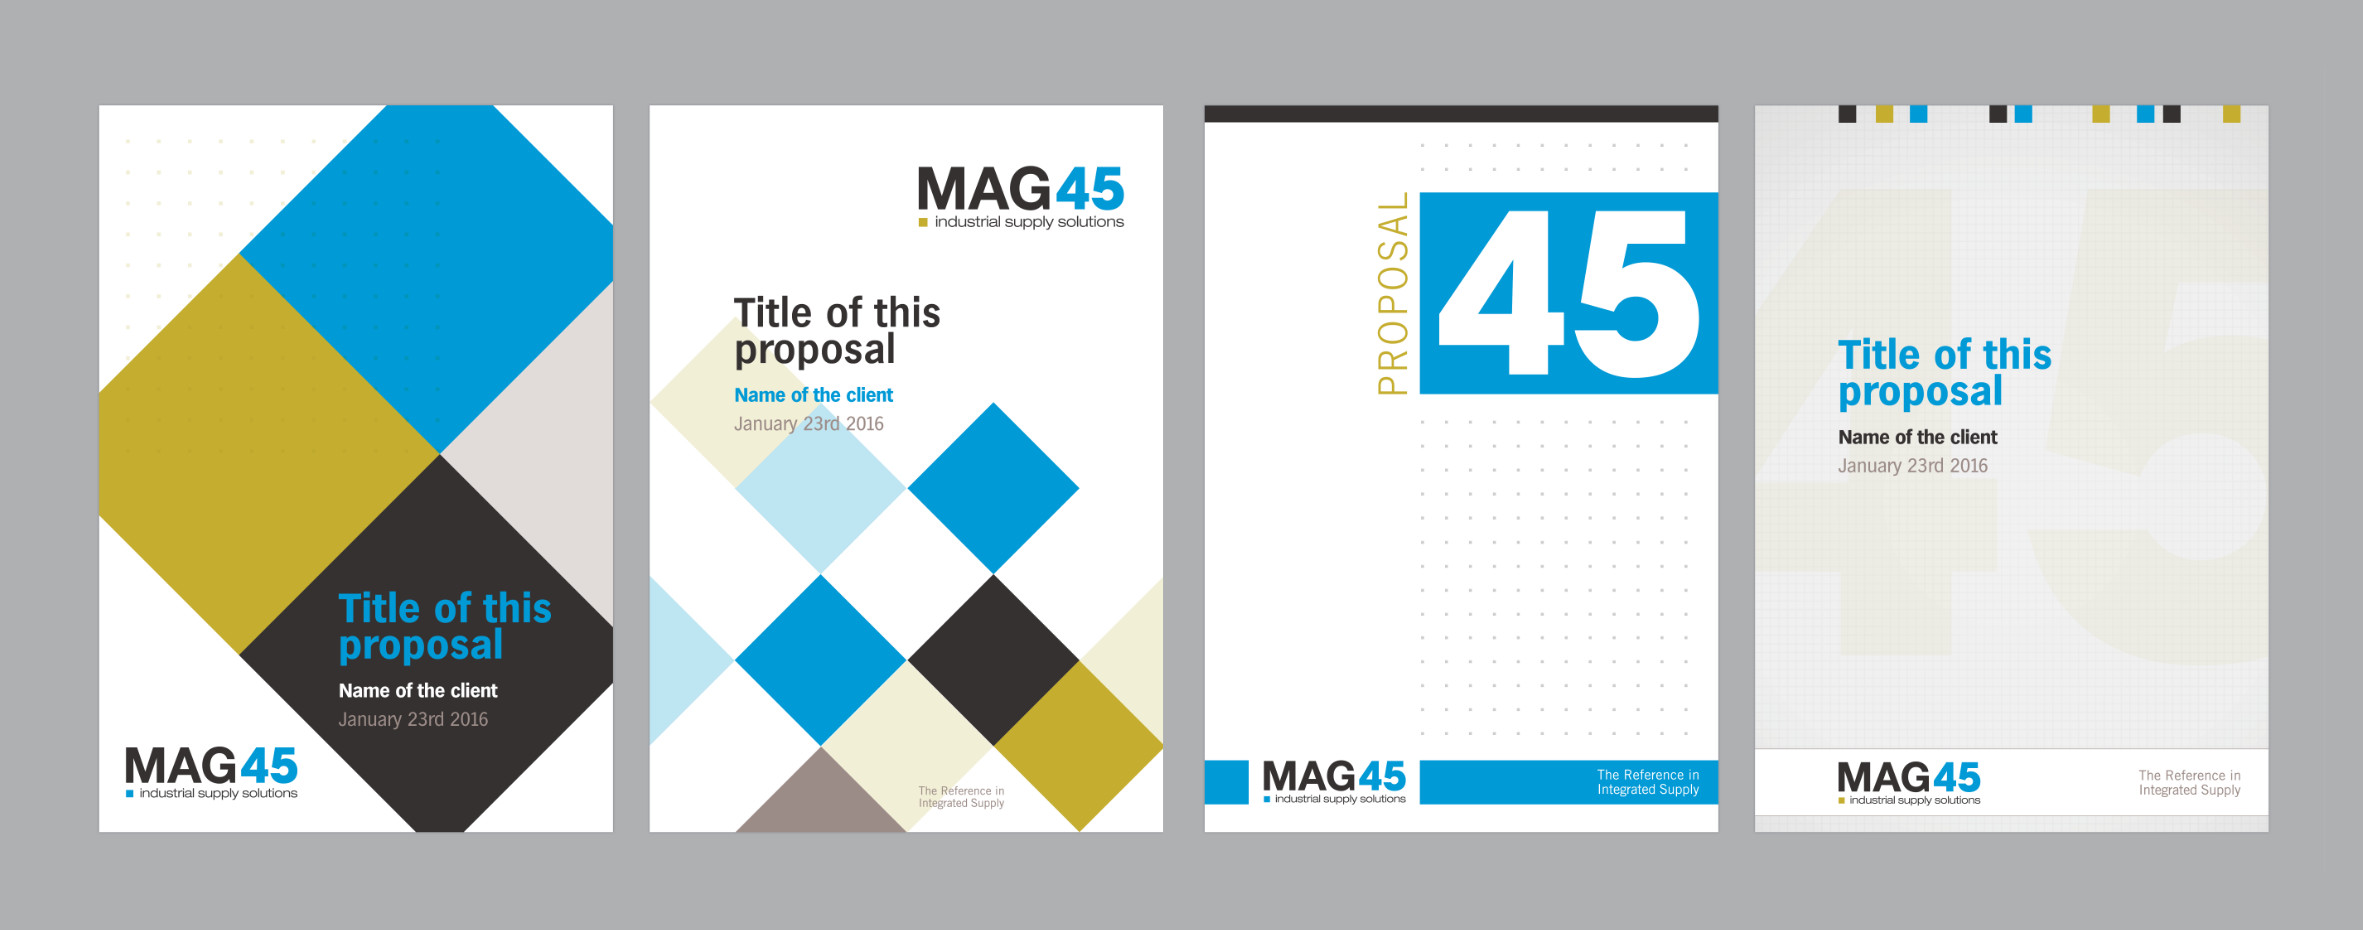 rapportomslagen MAG45